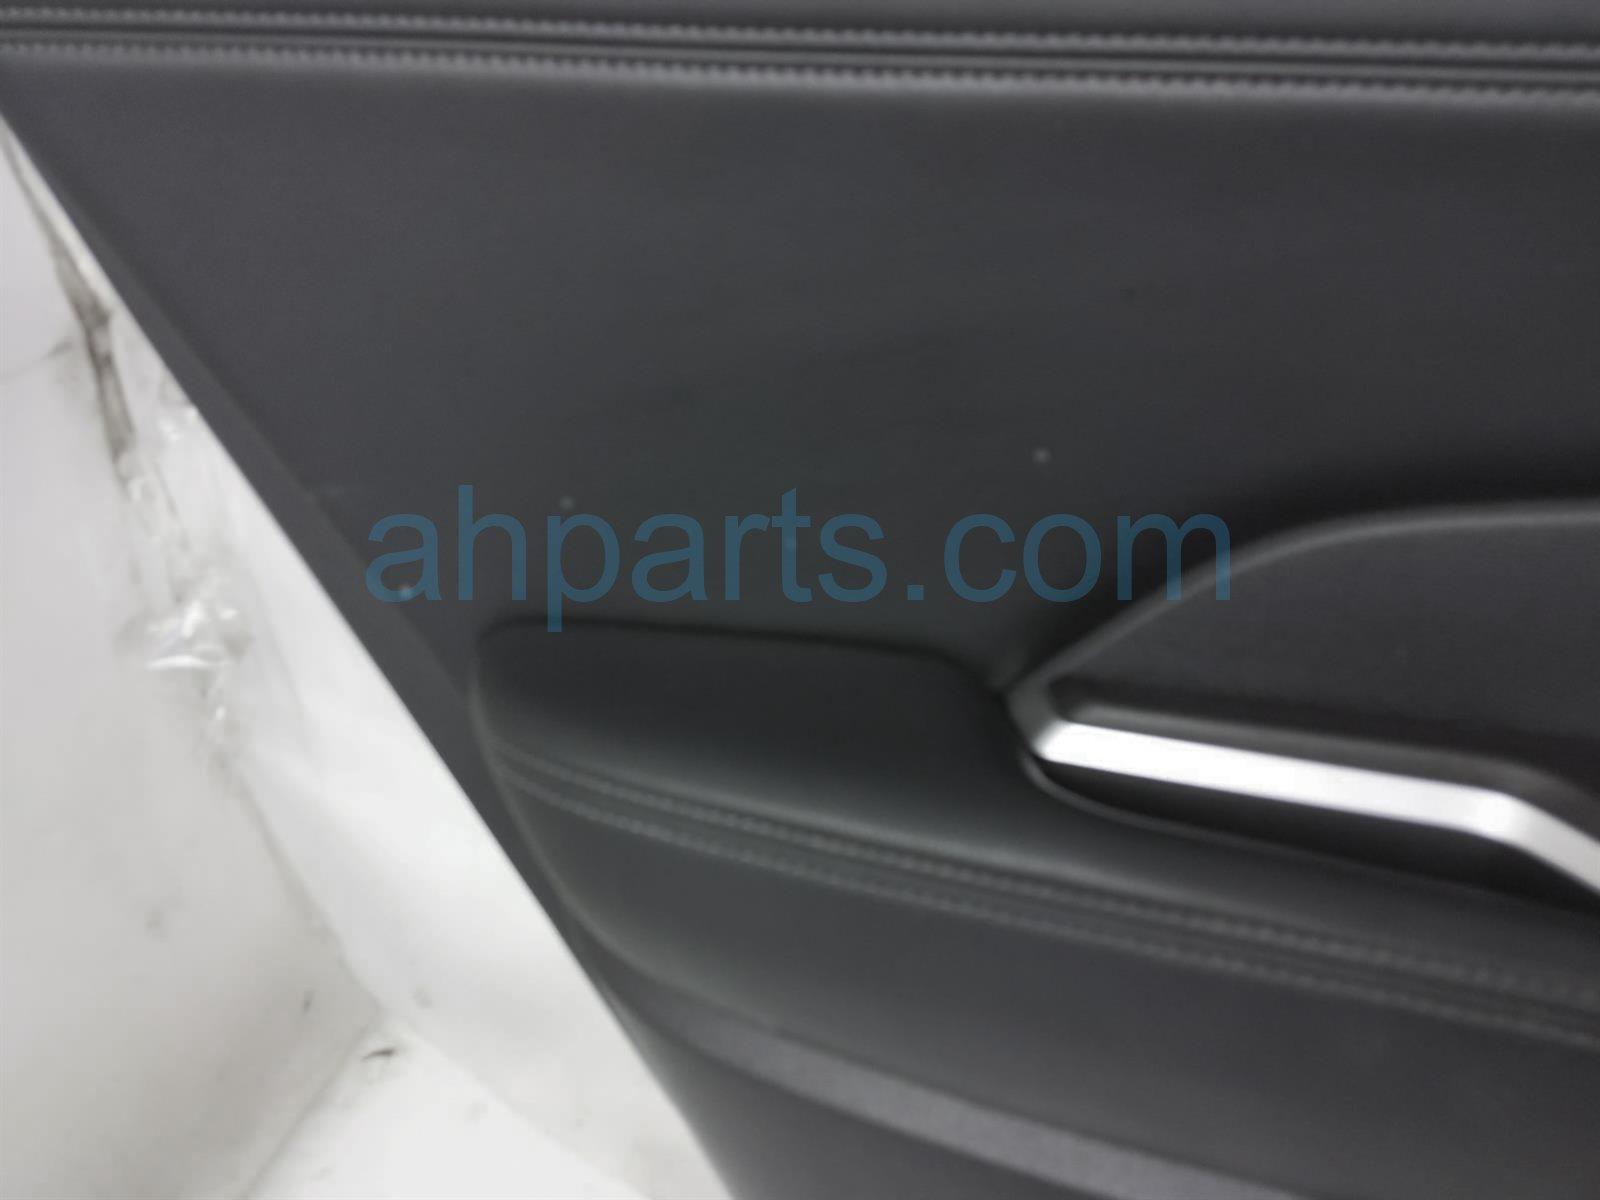 2018 Honda Clarity Trim / Liner Rear Driver Interior Door Panel   Black 83751 TRW A21ZB Replacement